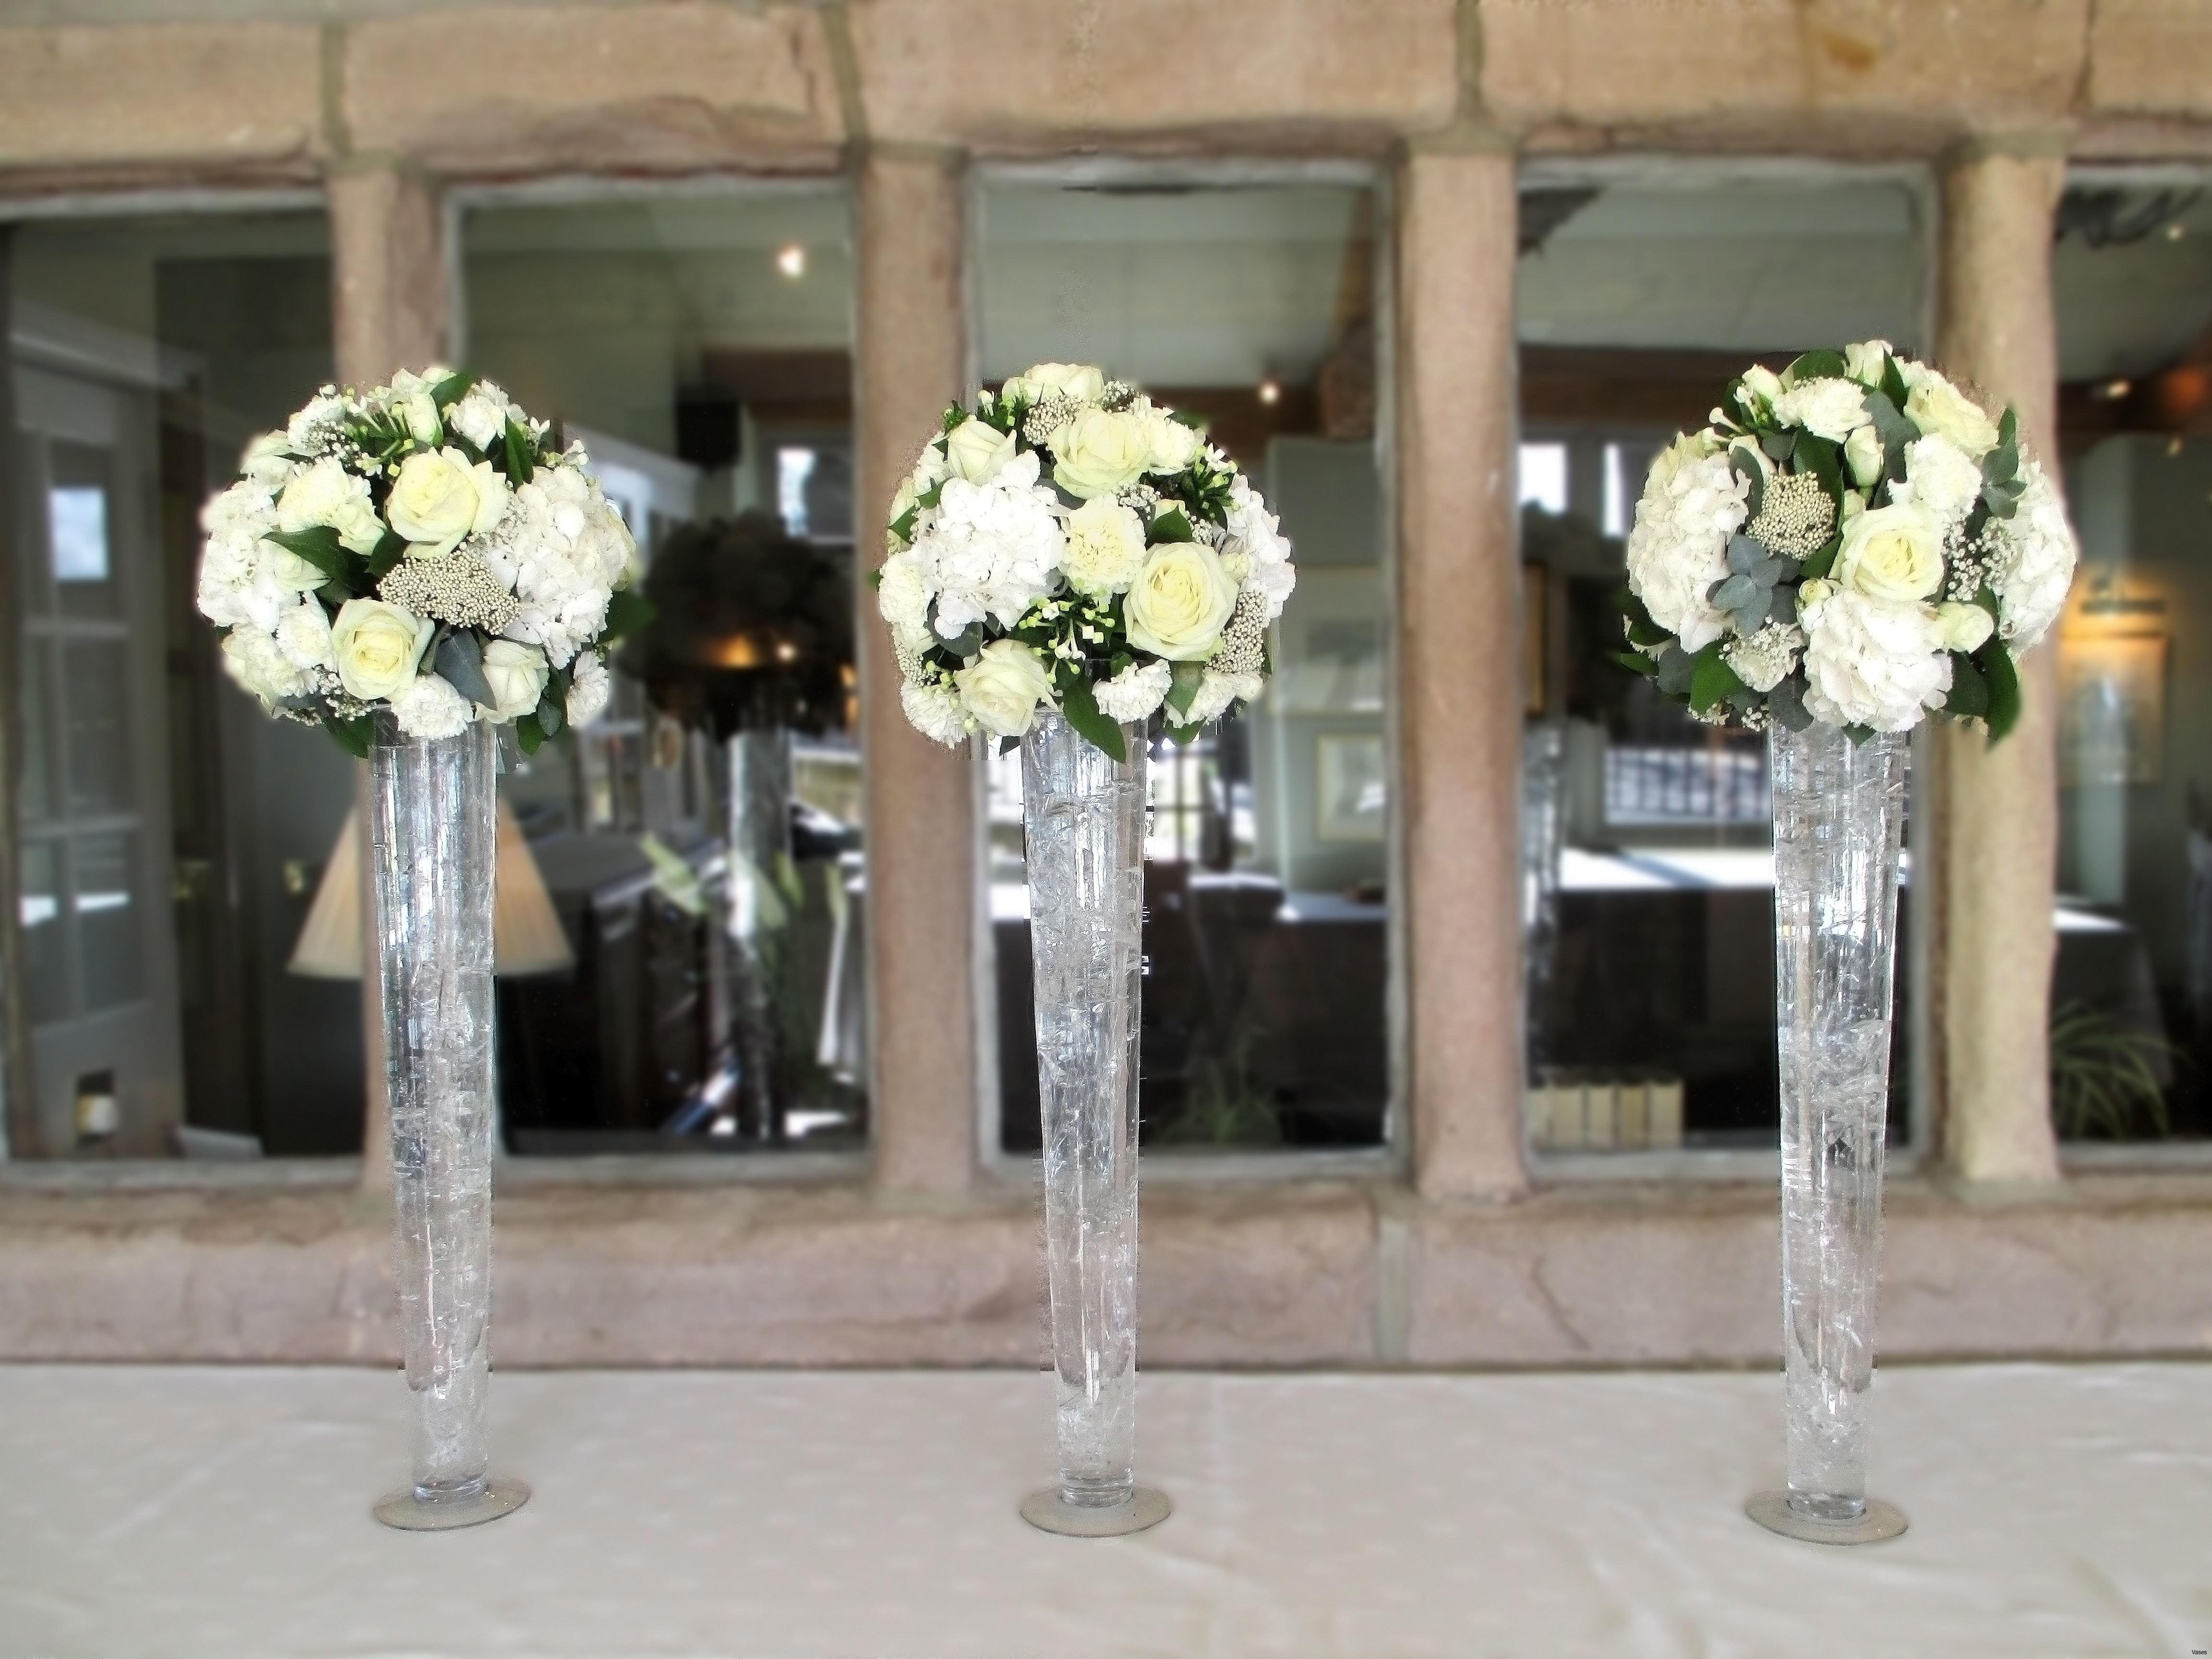 glass marble vase fillers of 14 luxury flower vase filler ideas bogekompresorturkiye com regarding decoration balls for vases vases tall floral diy centerpiecei 19d flower for wedding containers decoration